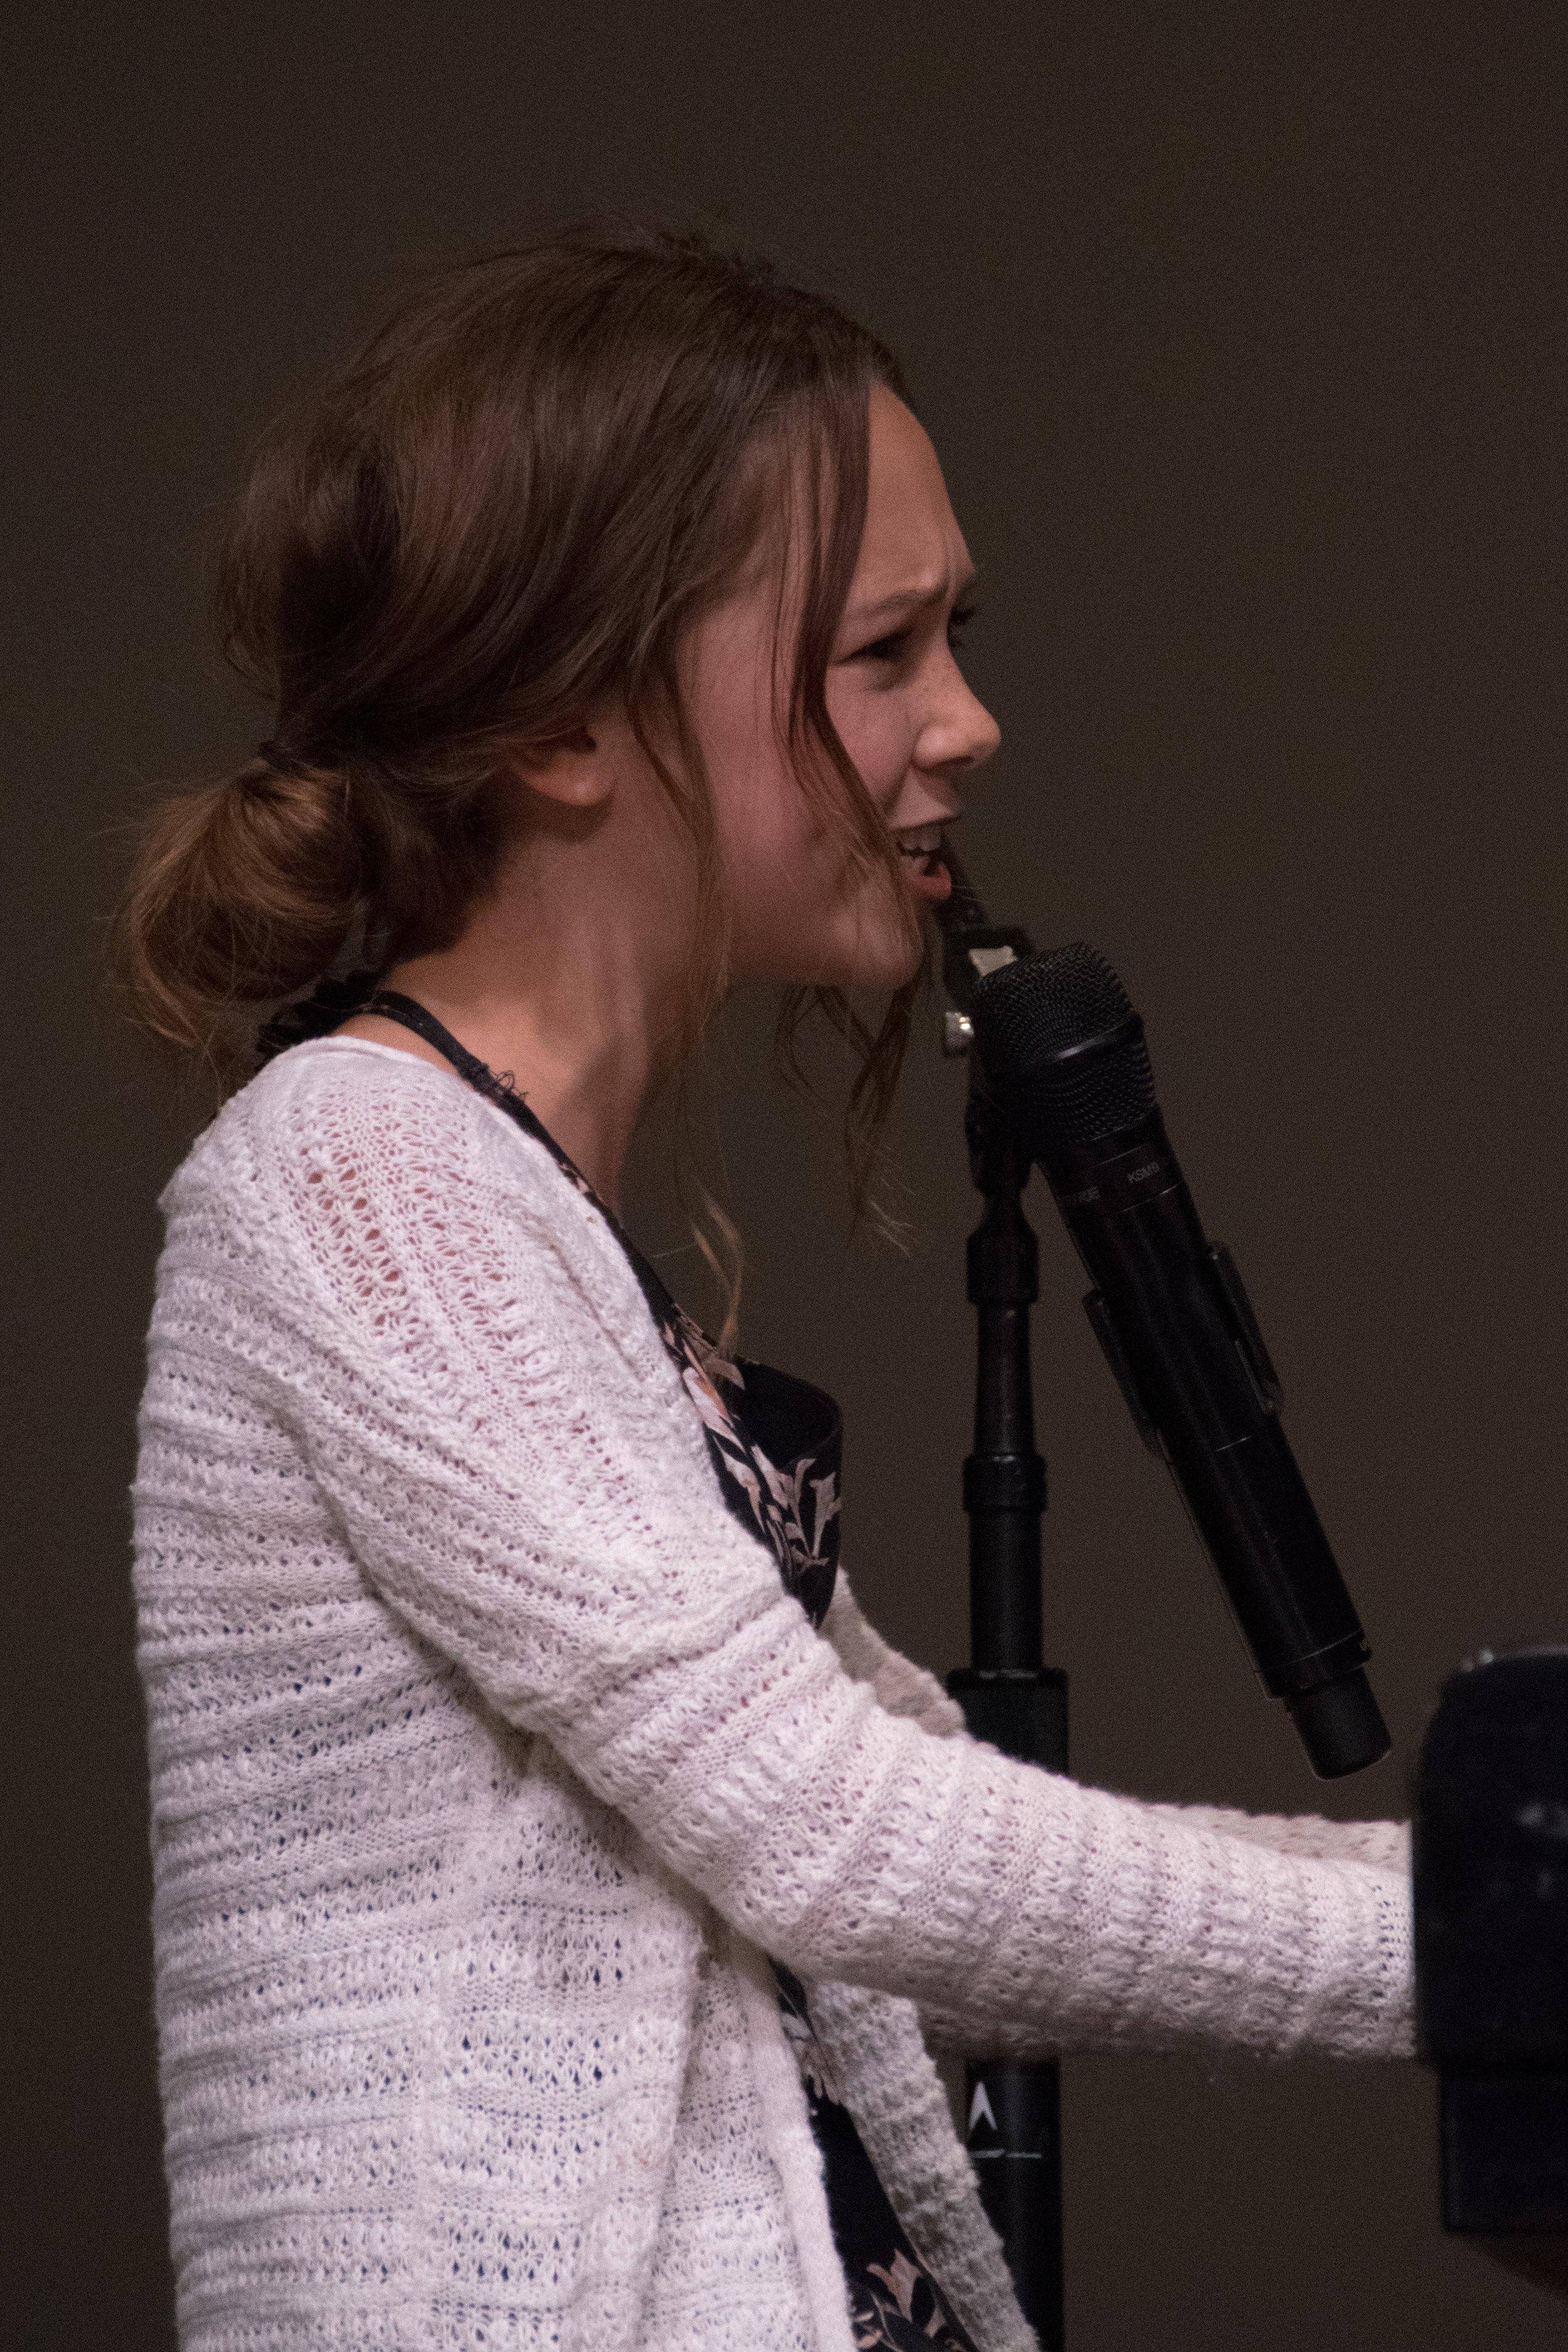 Madison Jaffin